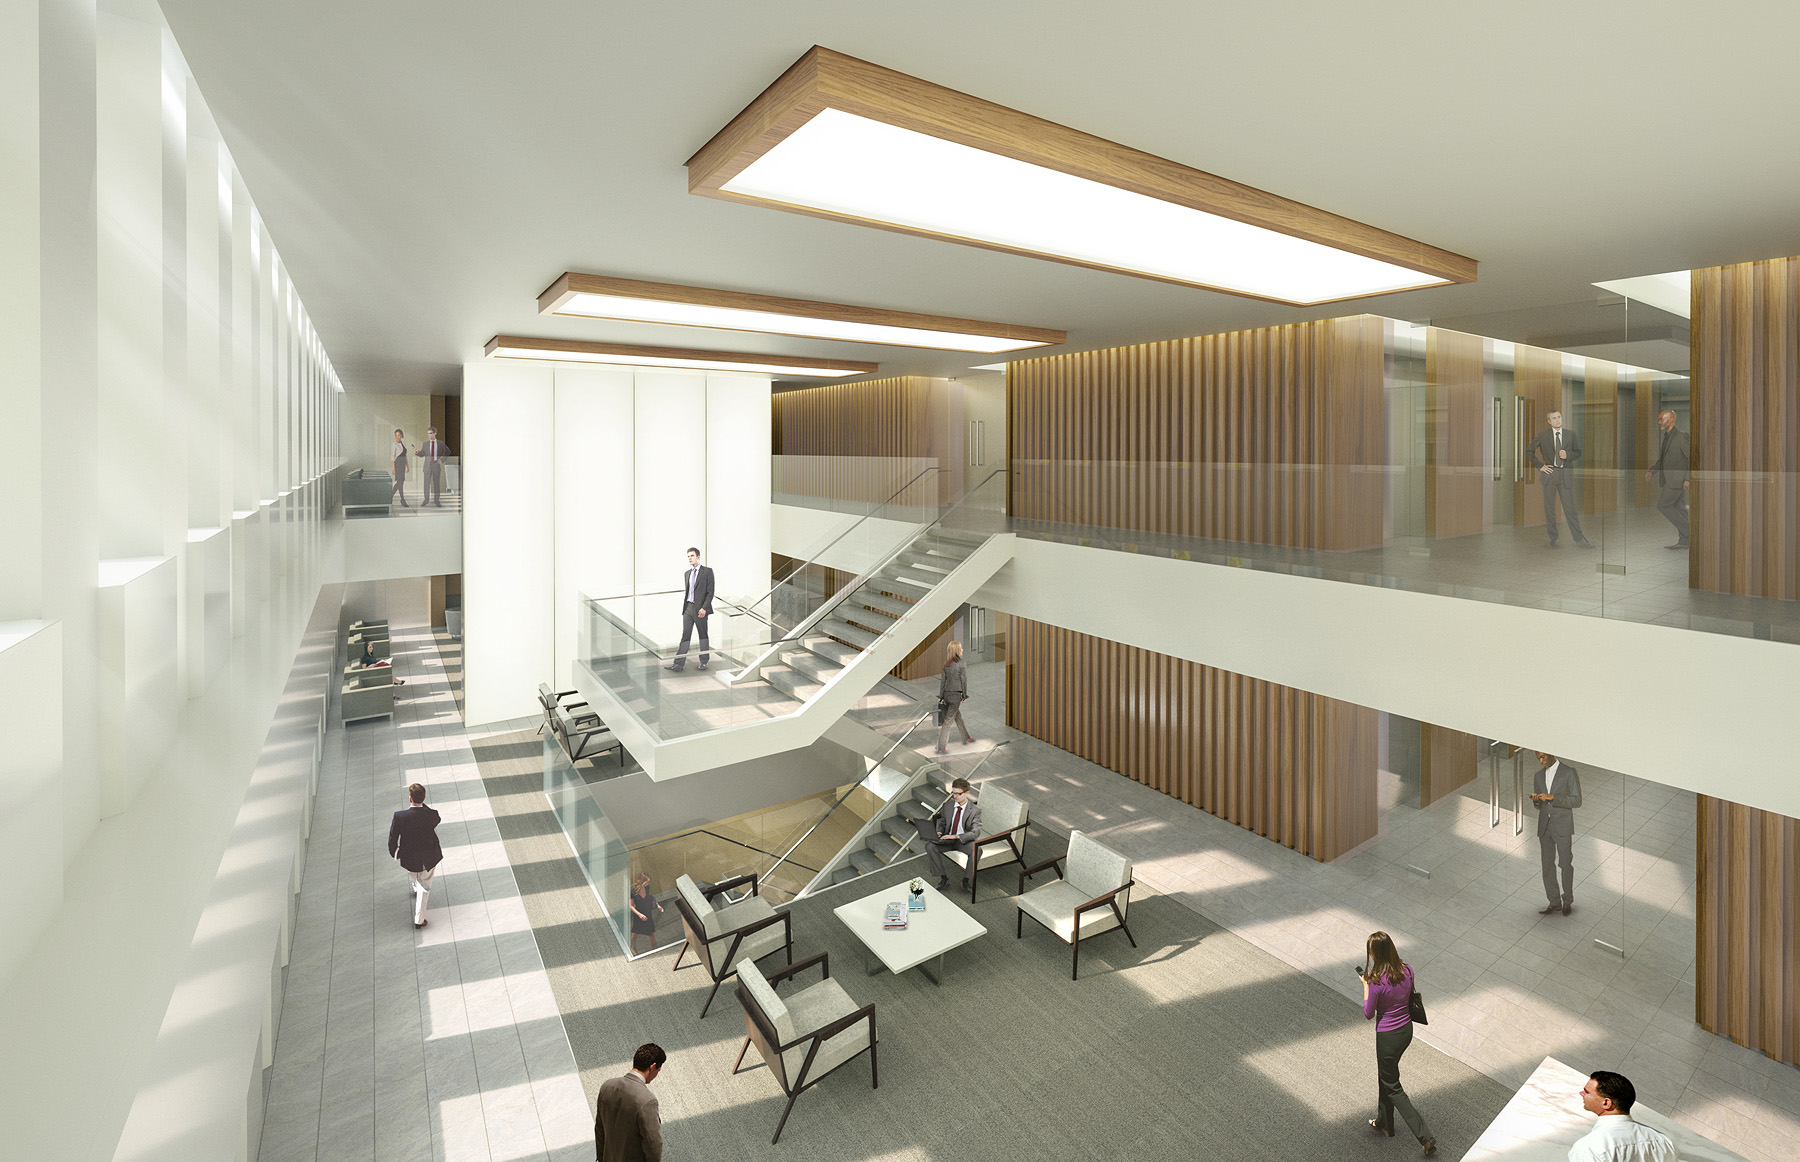 INTERIOR LOBBY CONCEPT   New York, NY |  Client: HYL Architecture